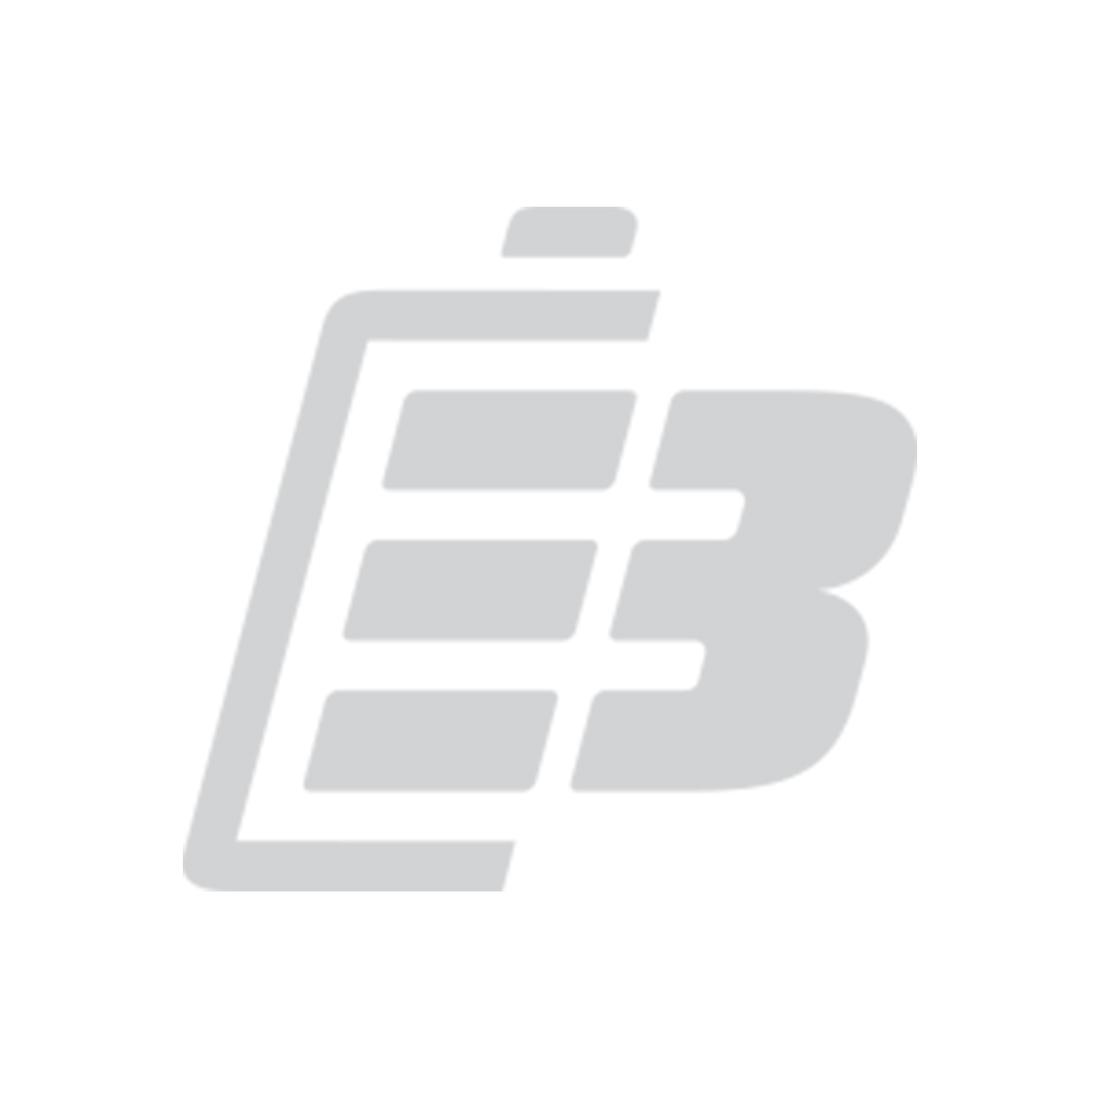 Fenix LD30 LED Flashlight_1